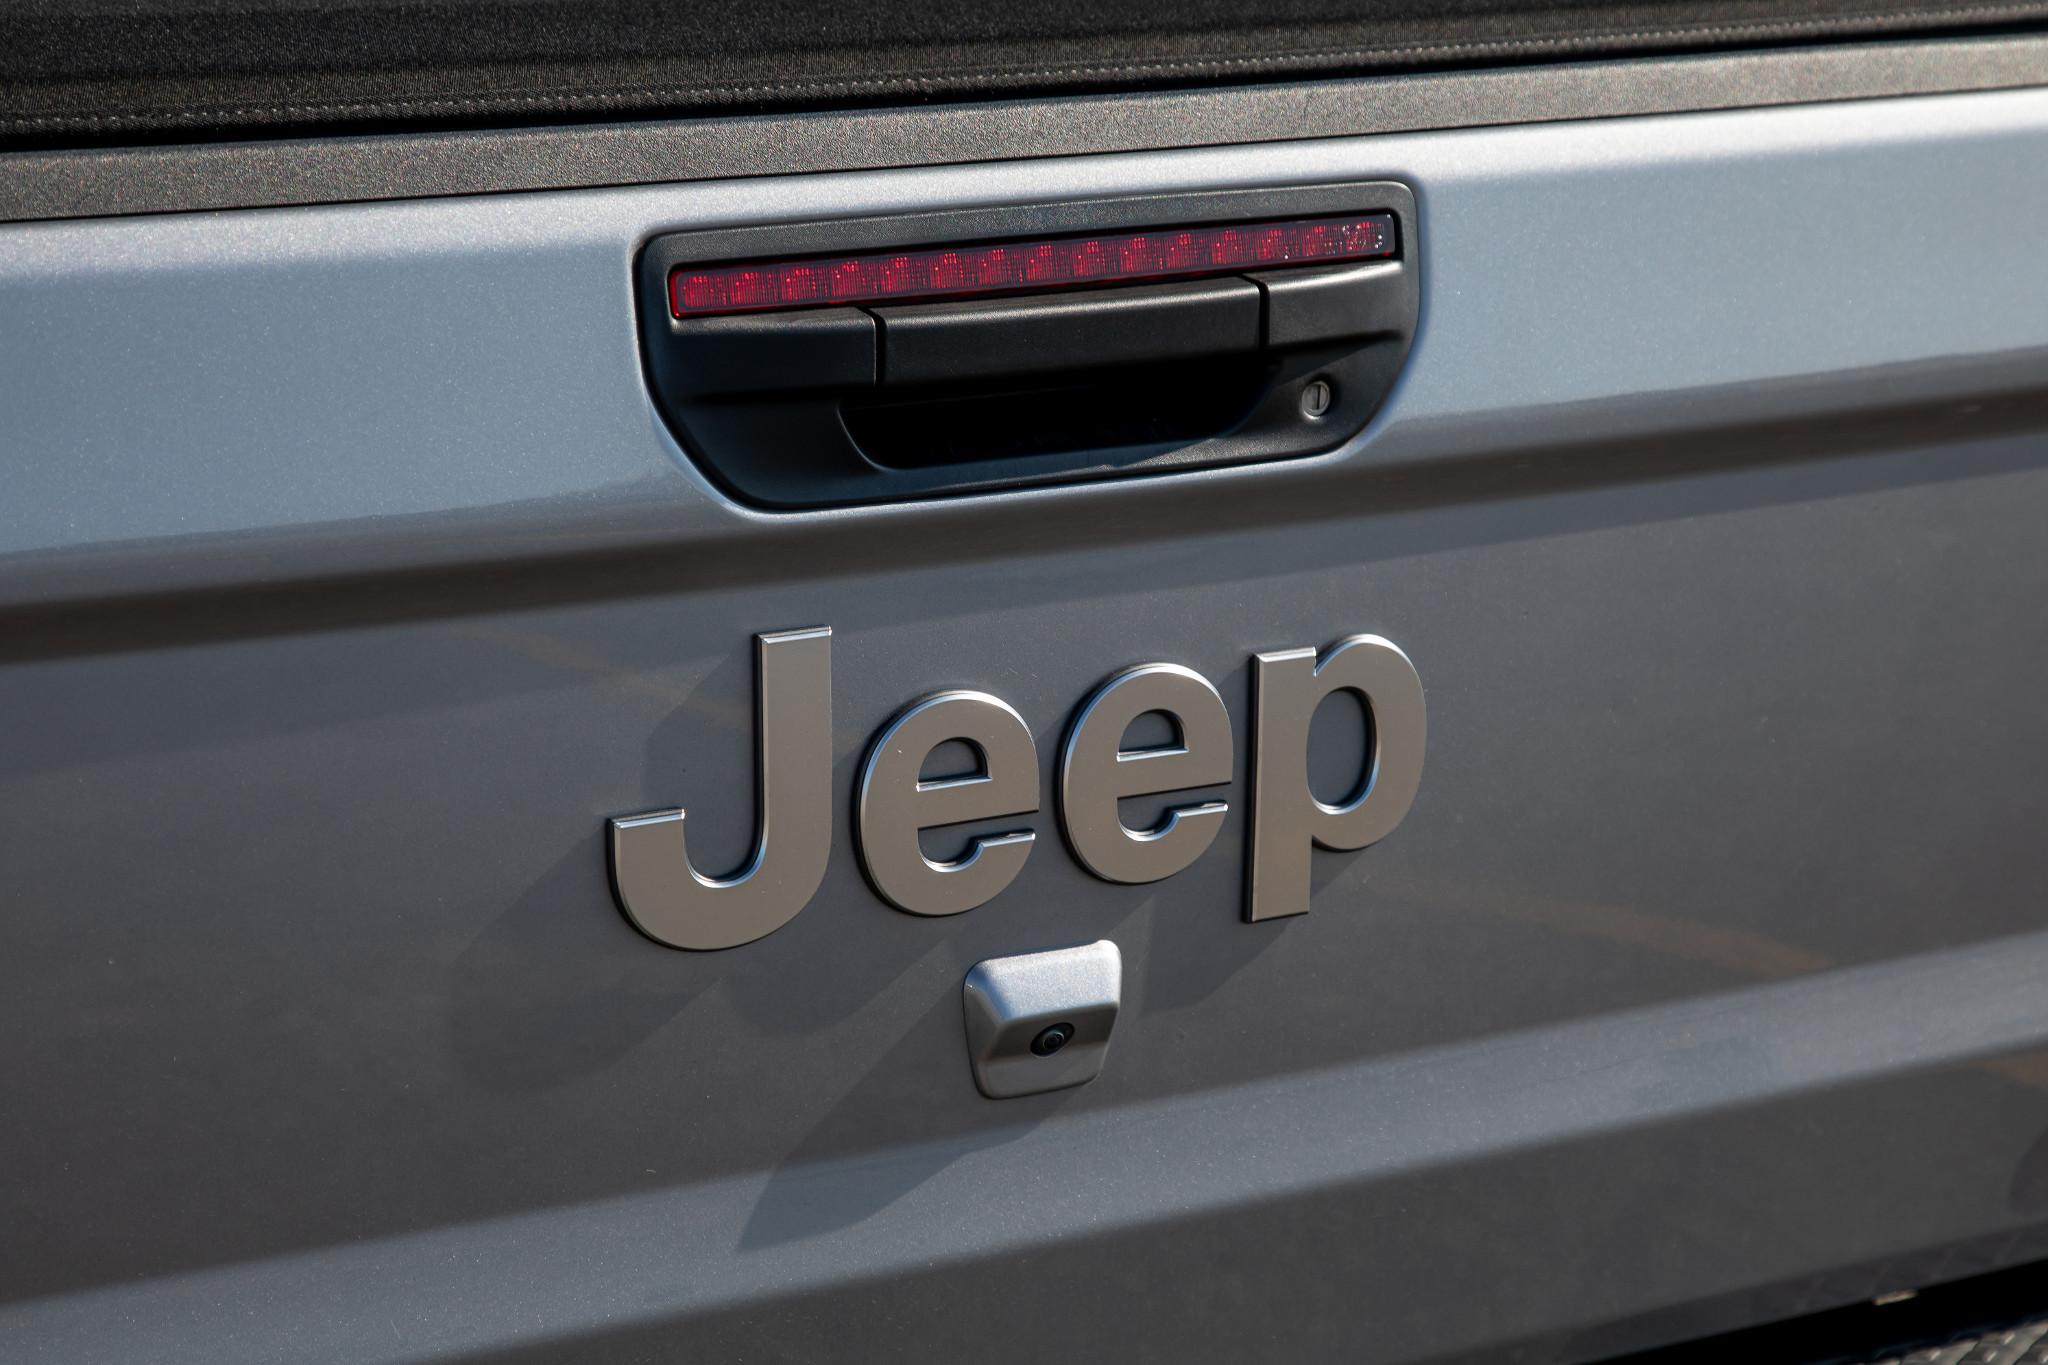 jeep-gladiator-2020-25-badge--exterior--rear--silver.jpg